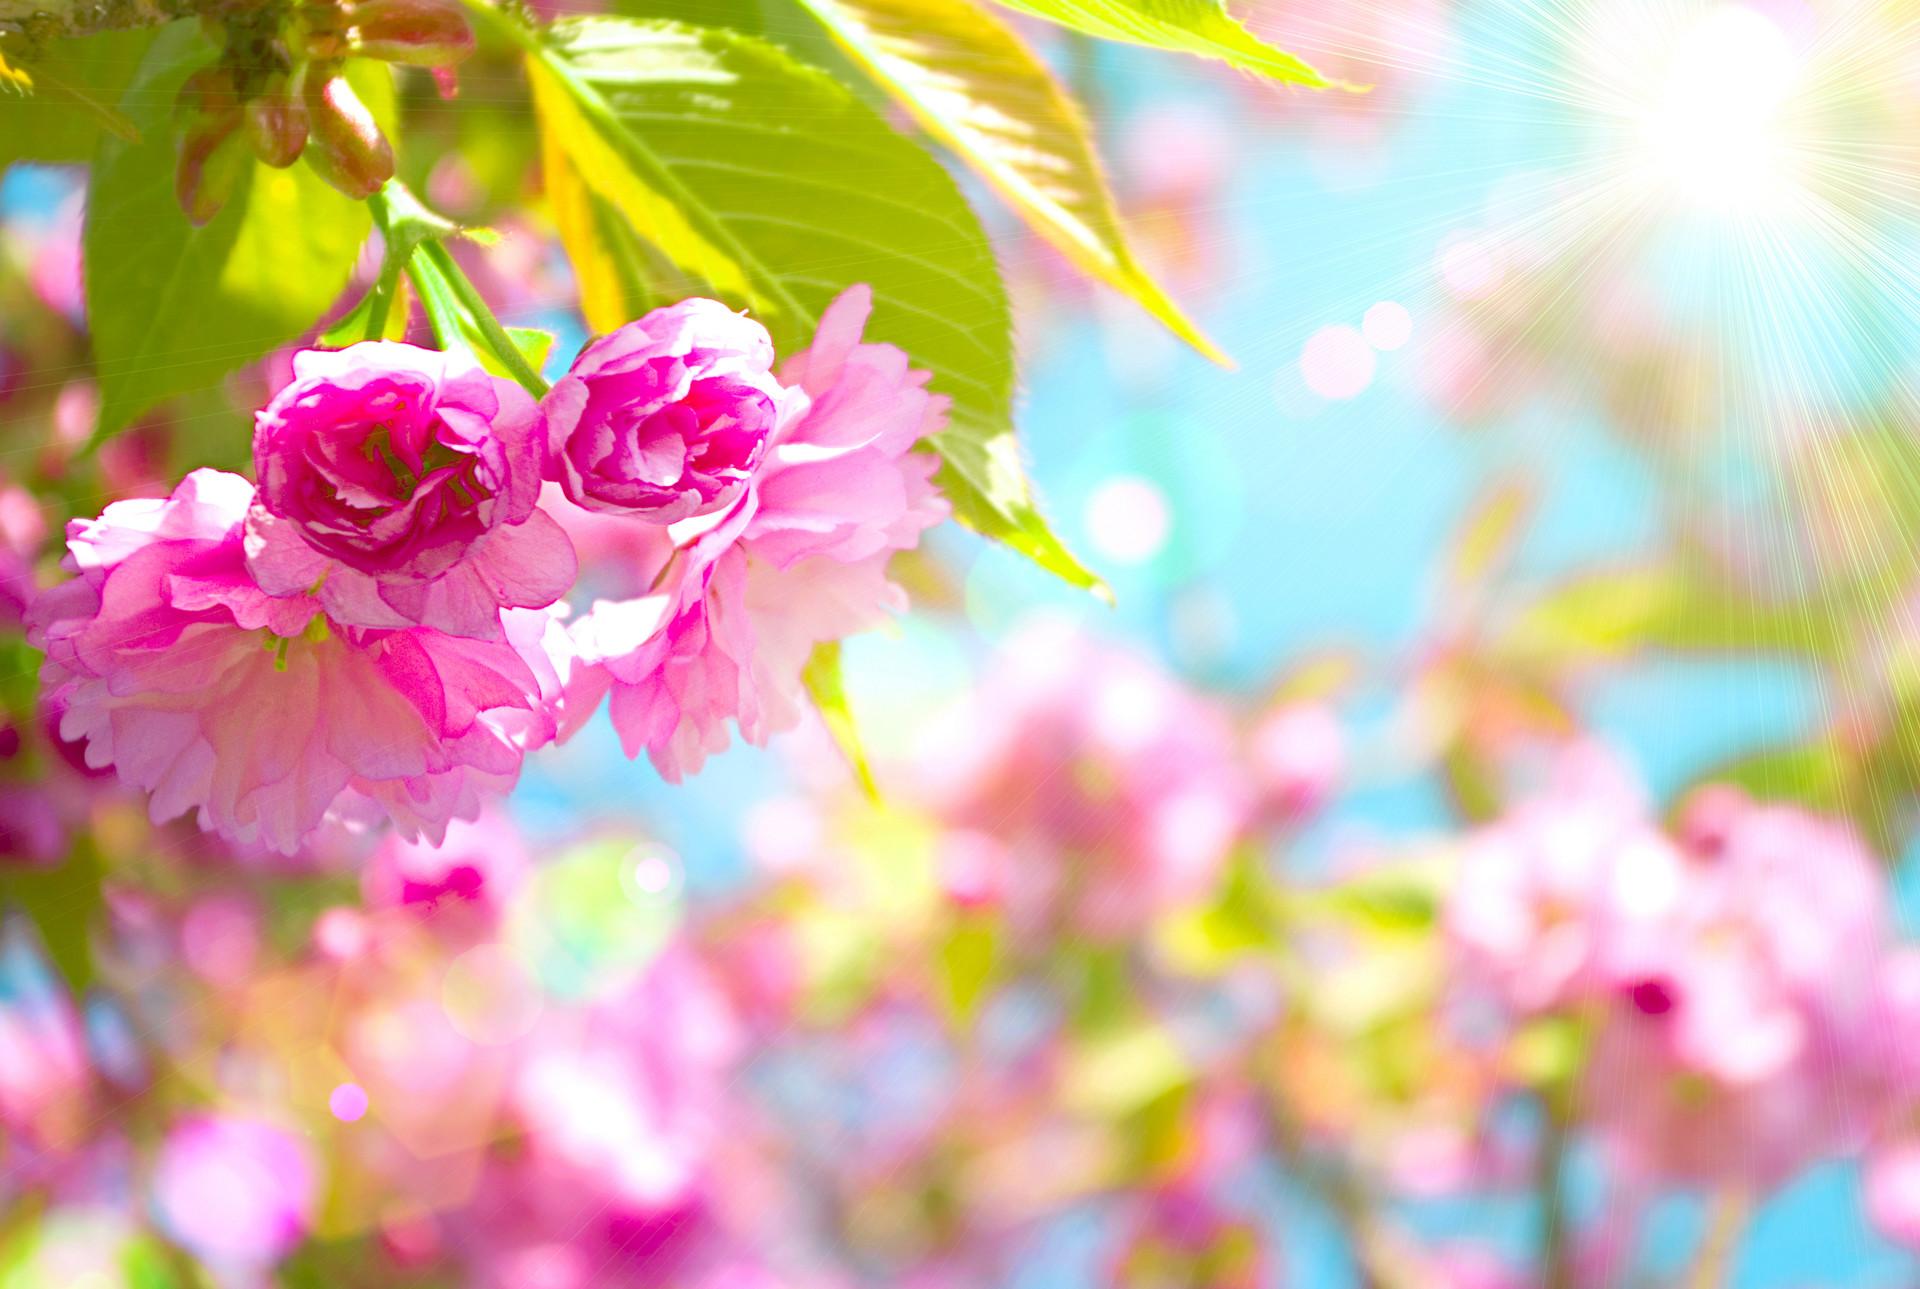 Res: 1920x1289, Art-Images-Spring-Desktop-Wallpaper-HD